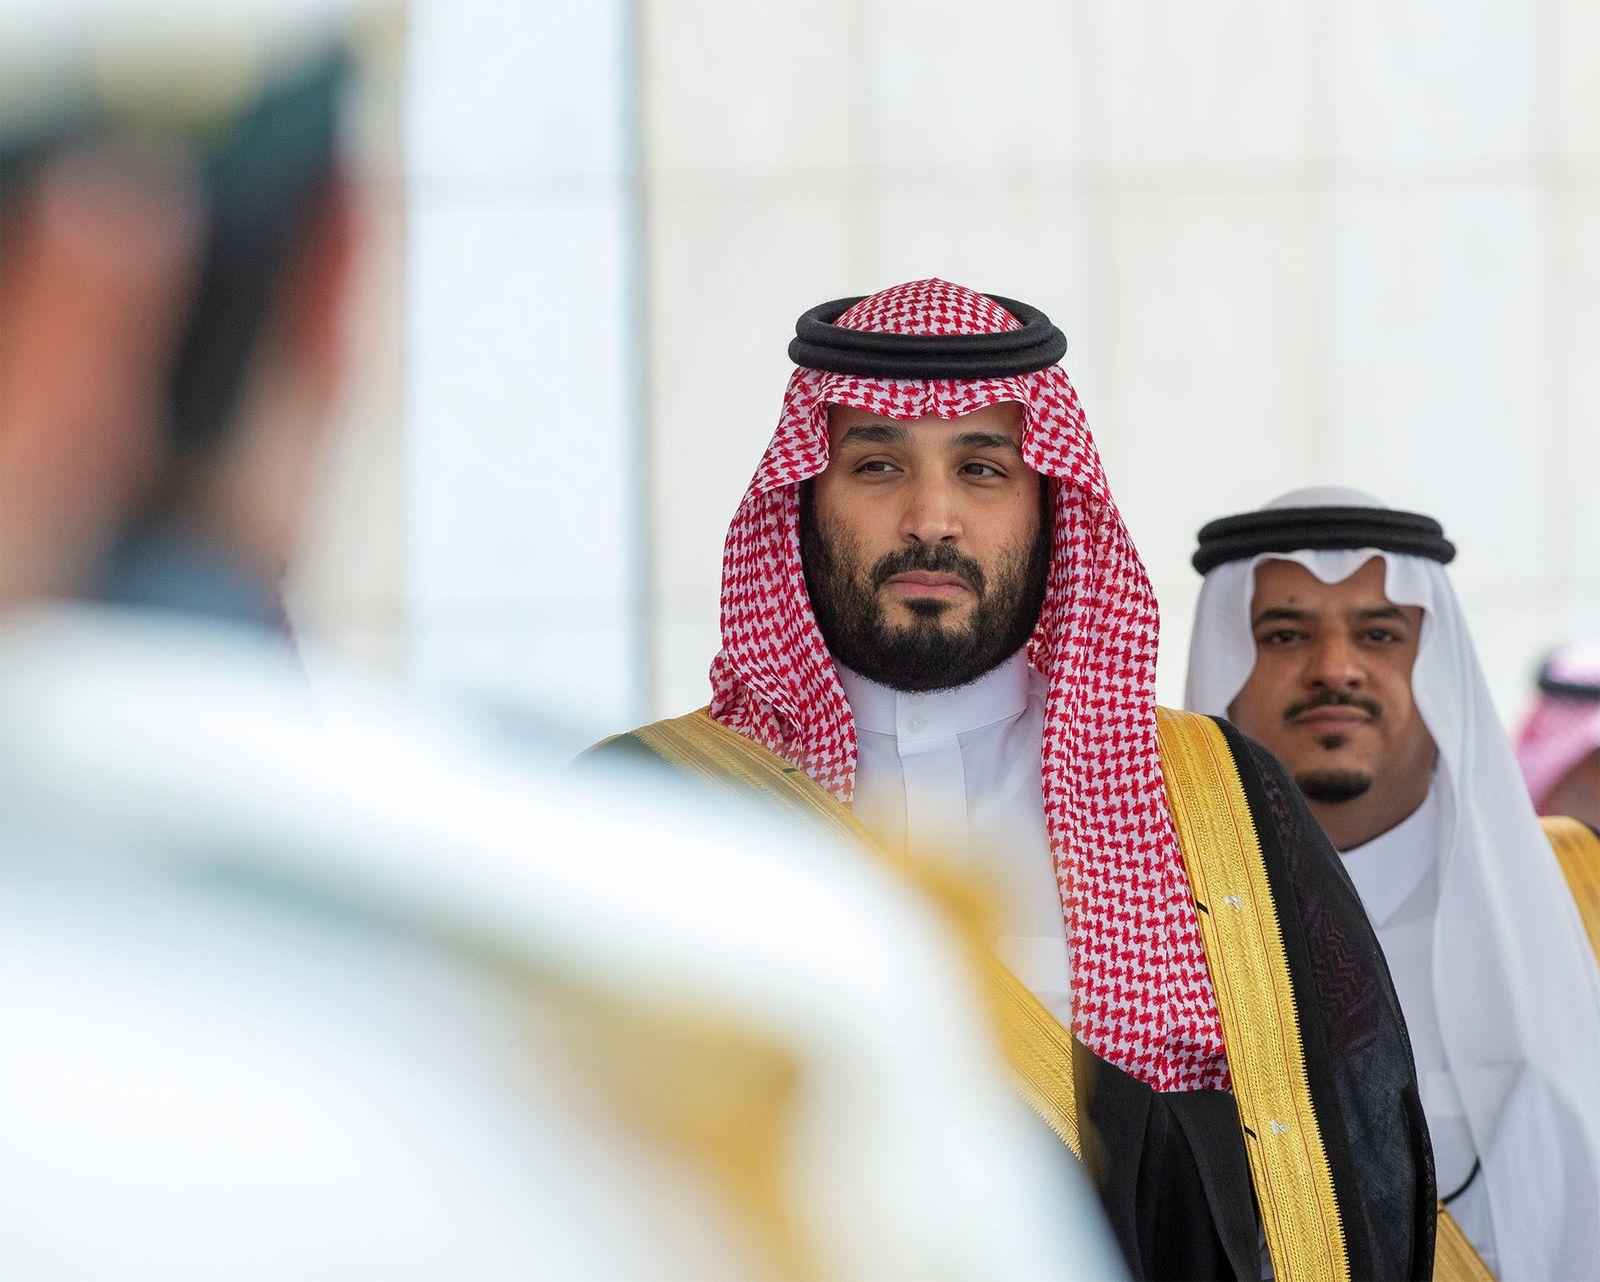 Saudi Crown Prince Mohammed bin Salman attends a session of the Shura Council in Riyadh